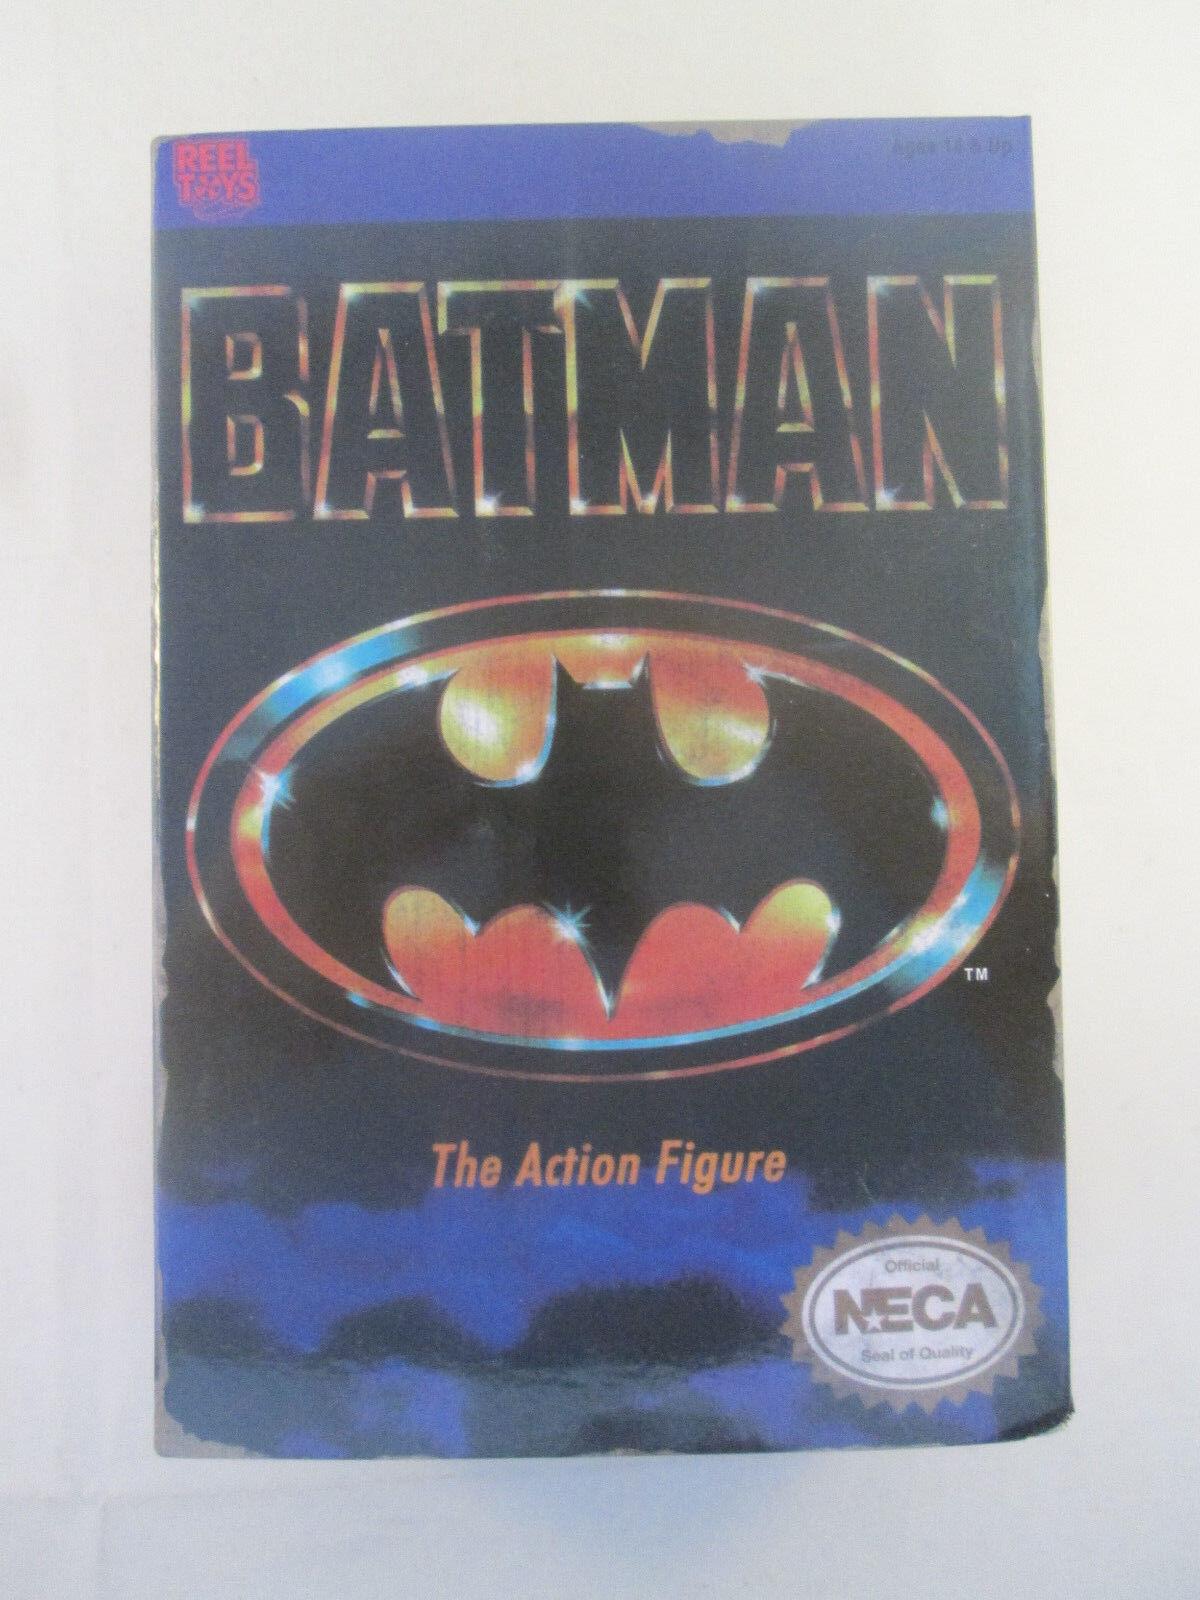 Neca batman wurde der action - figur neu - reel film - klassiker - spielzeug